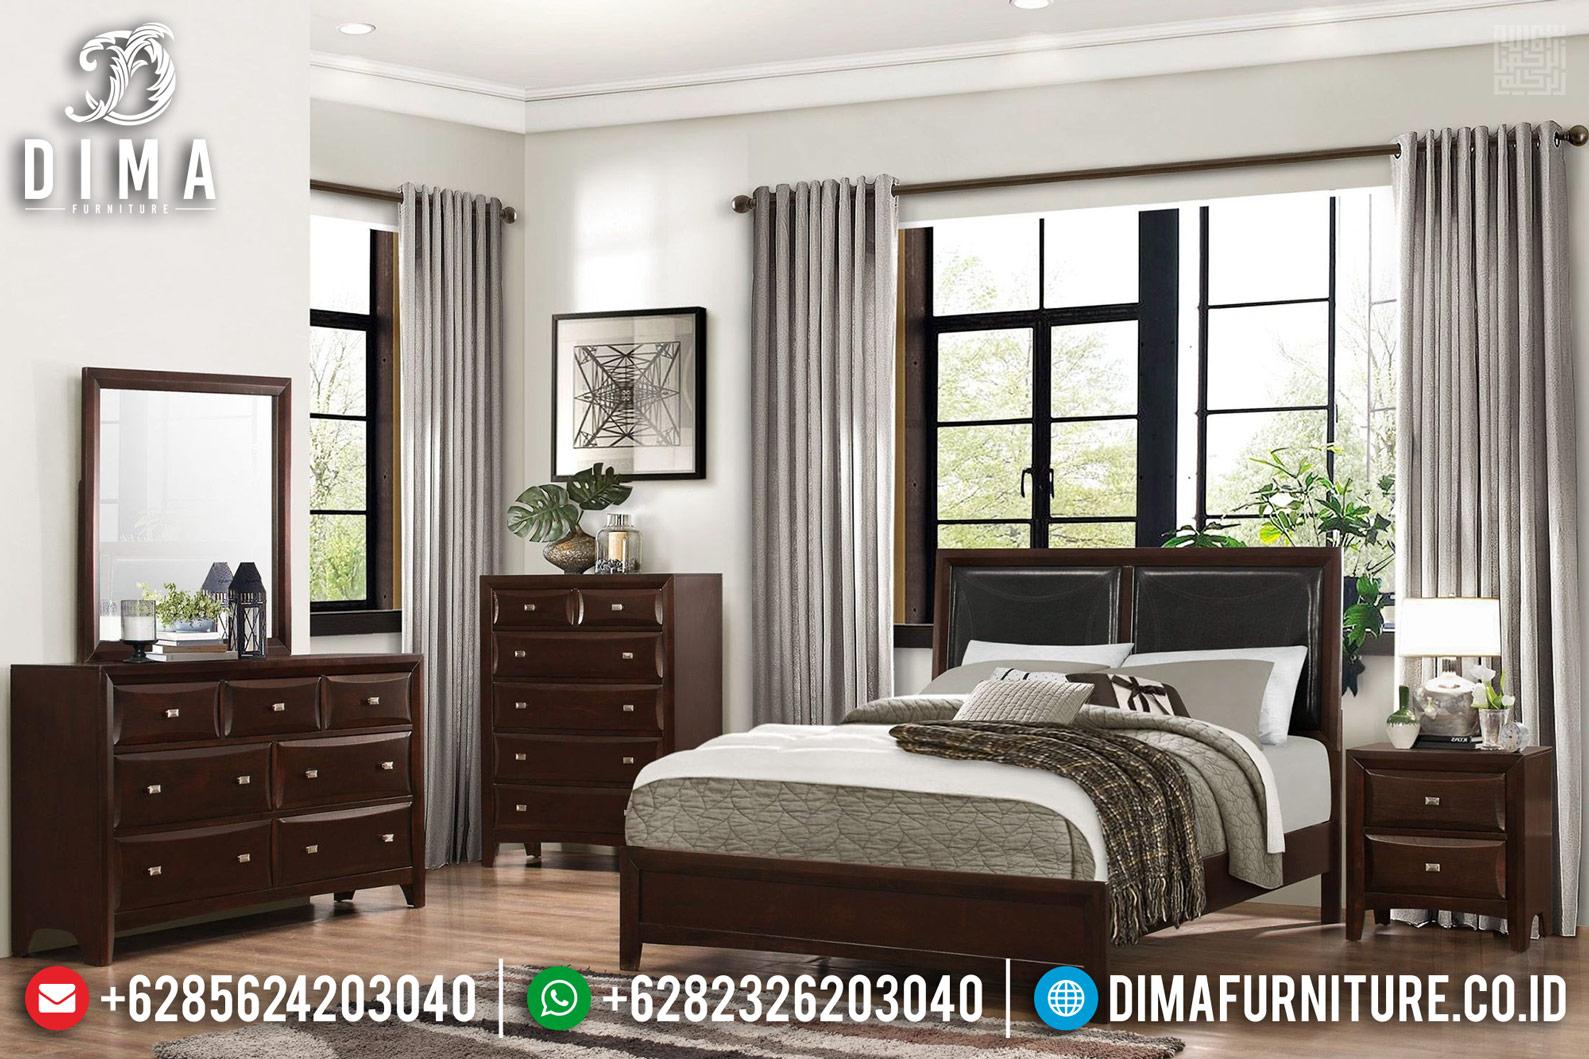 Tempat Tidur Minimalis Jati Natural Classic New Furniture Jepara TTJ-0685